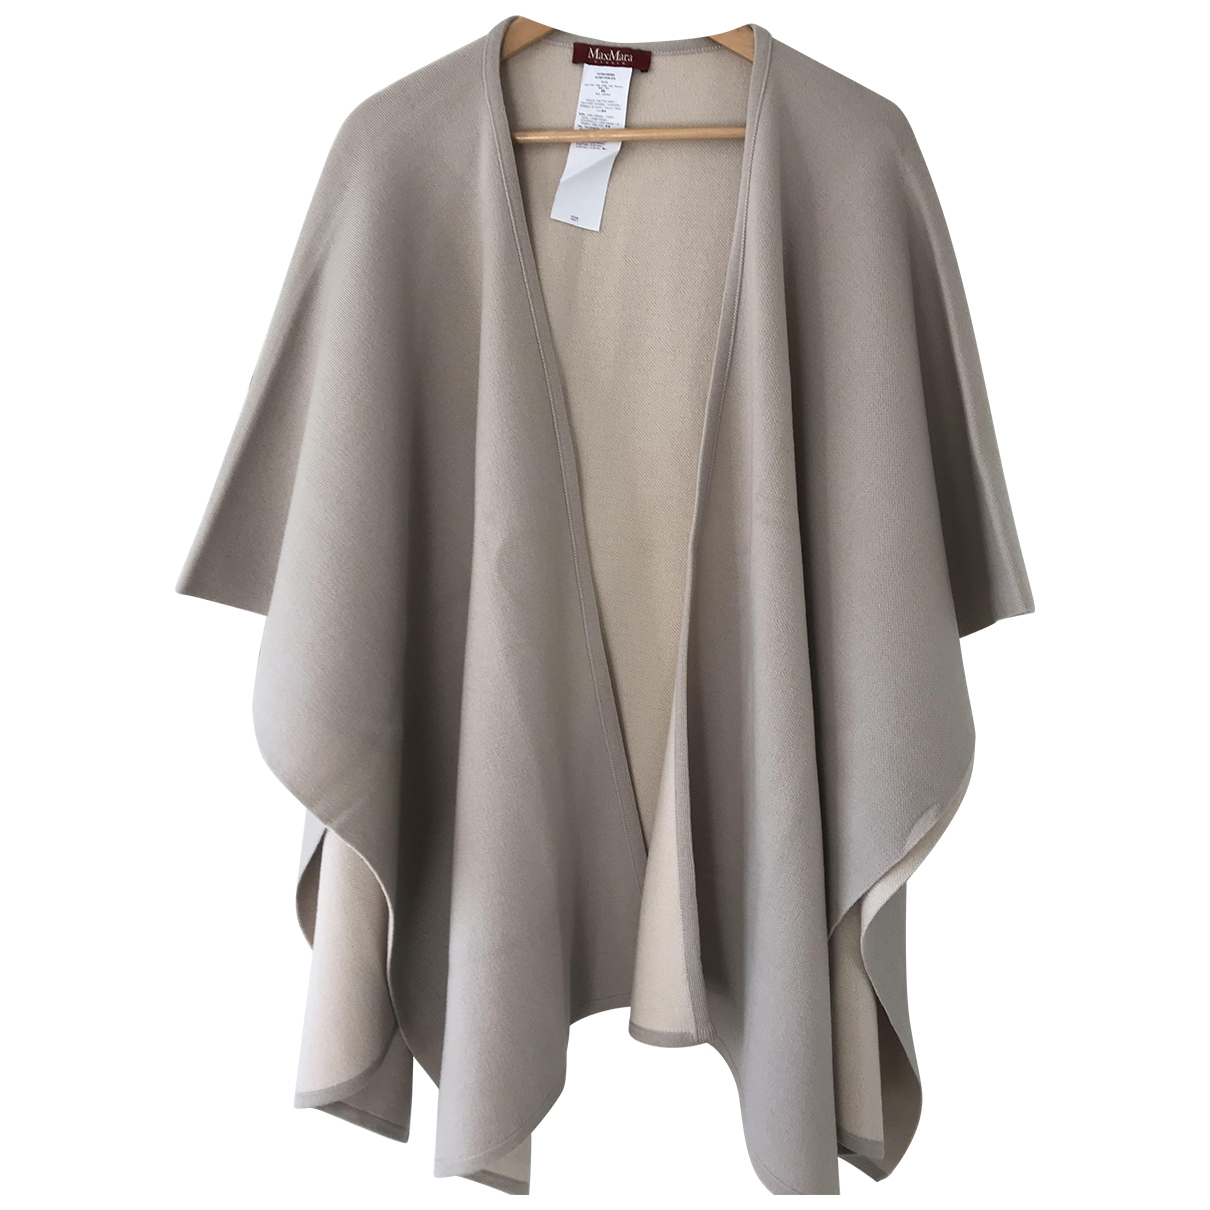 Max Mara Studio \N Beige Wool coat for Women S International